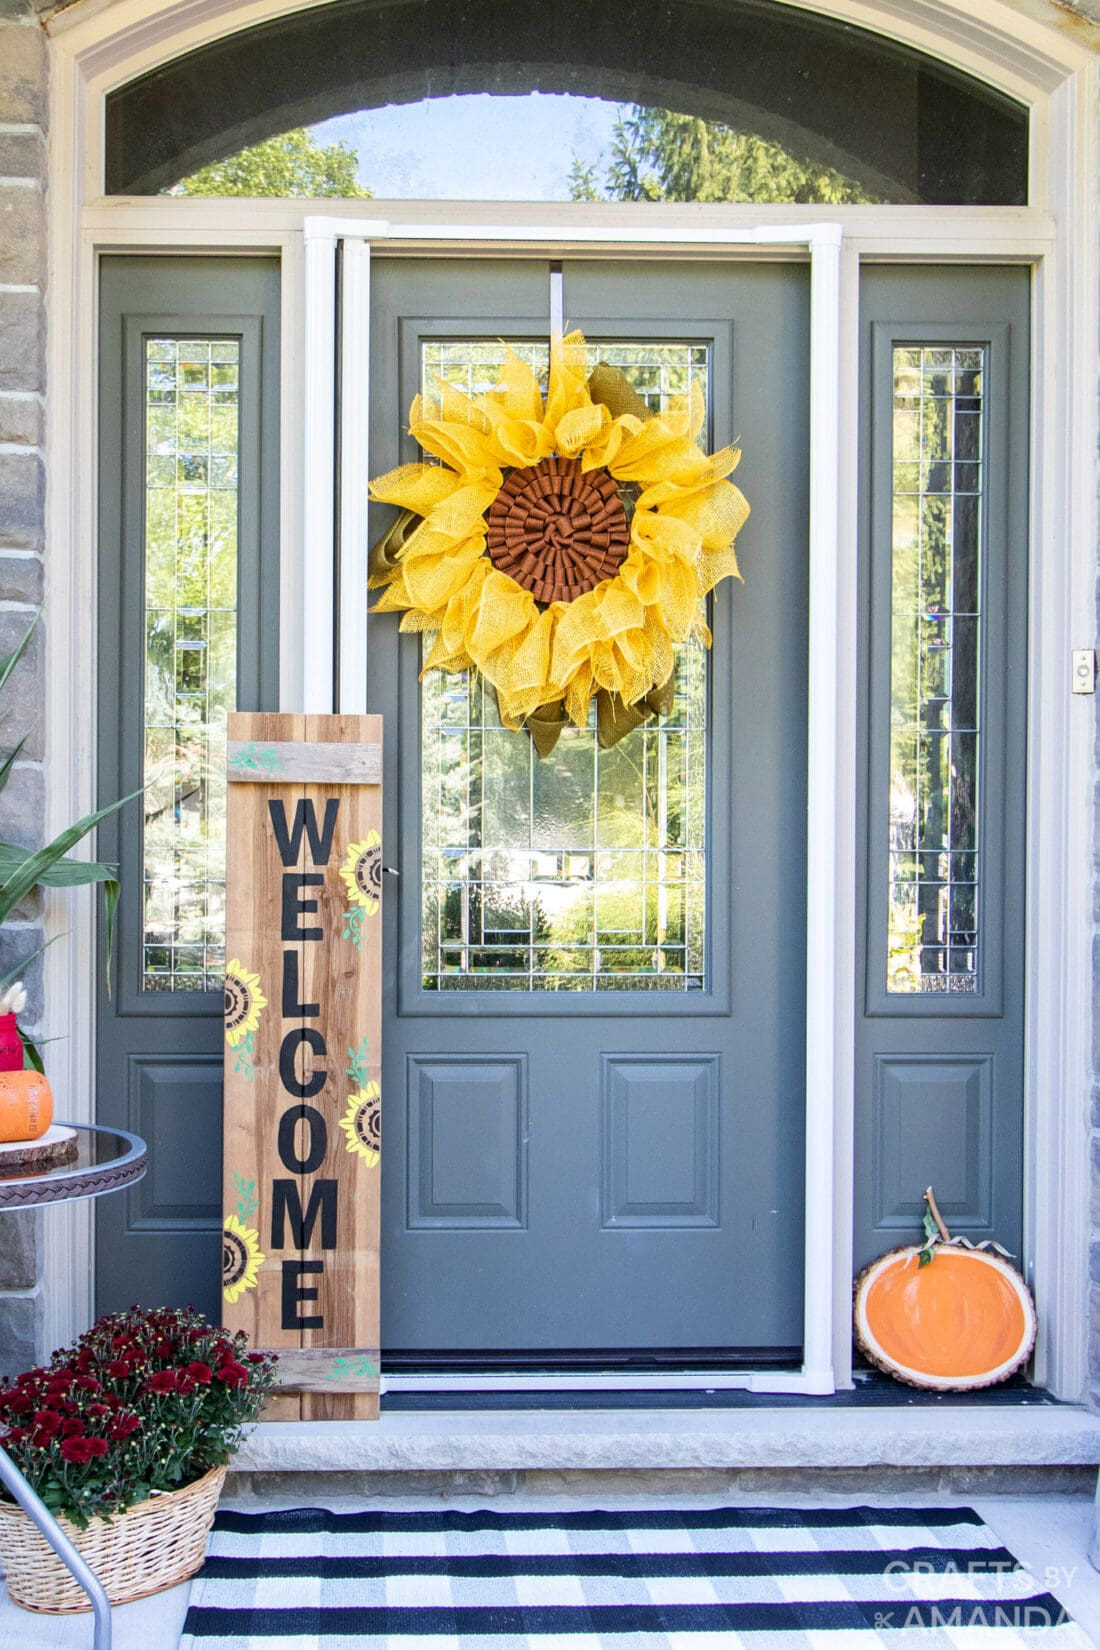 Sunflower Welcome Sign next to the door